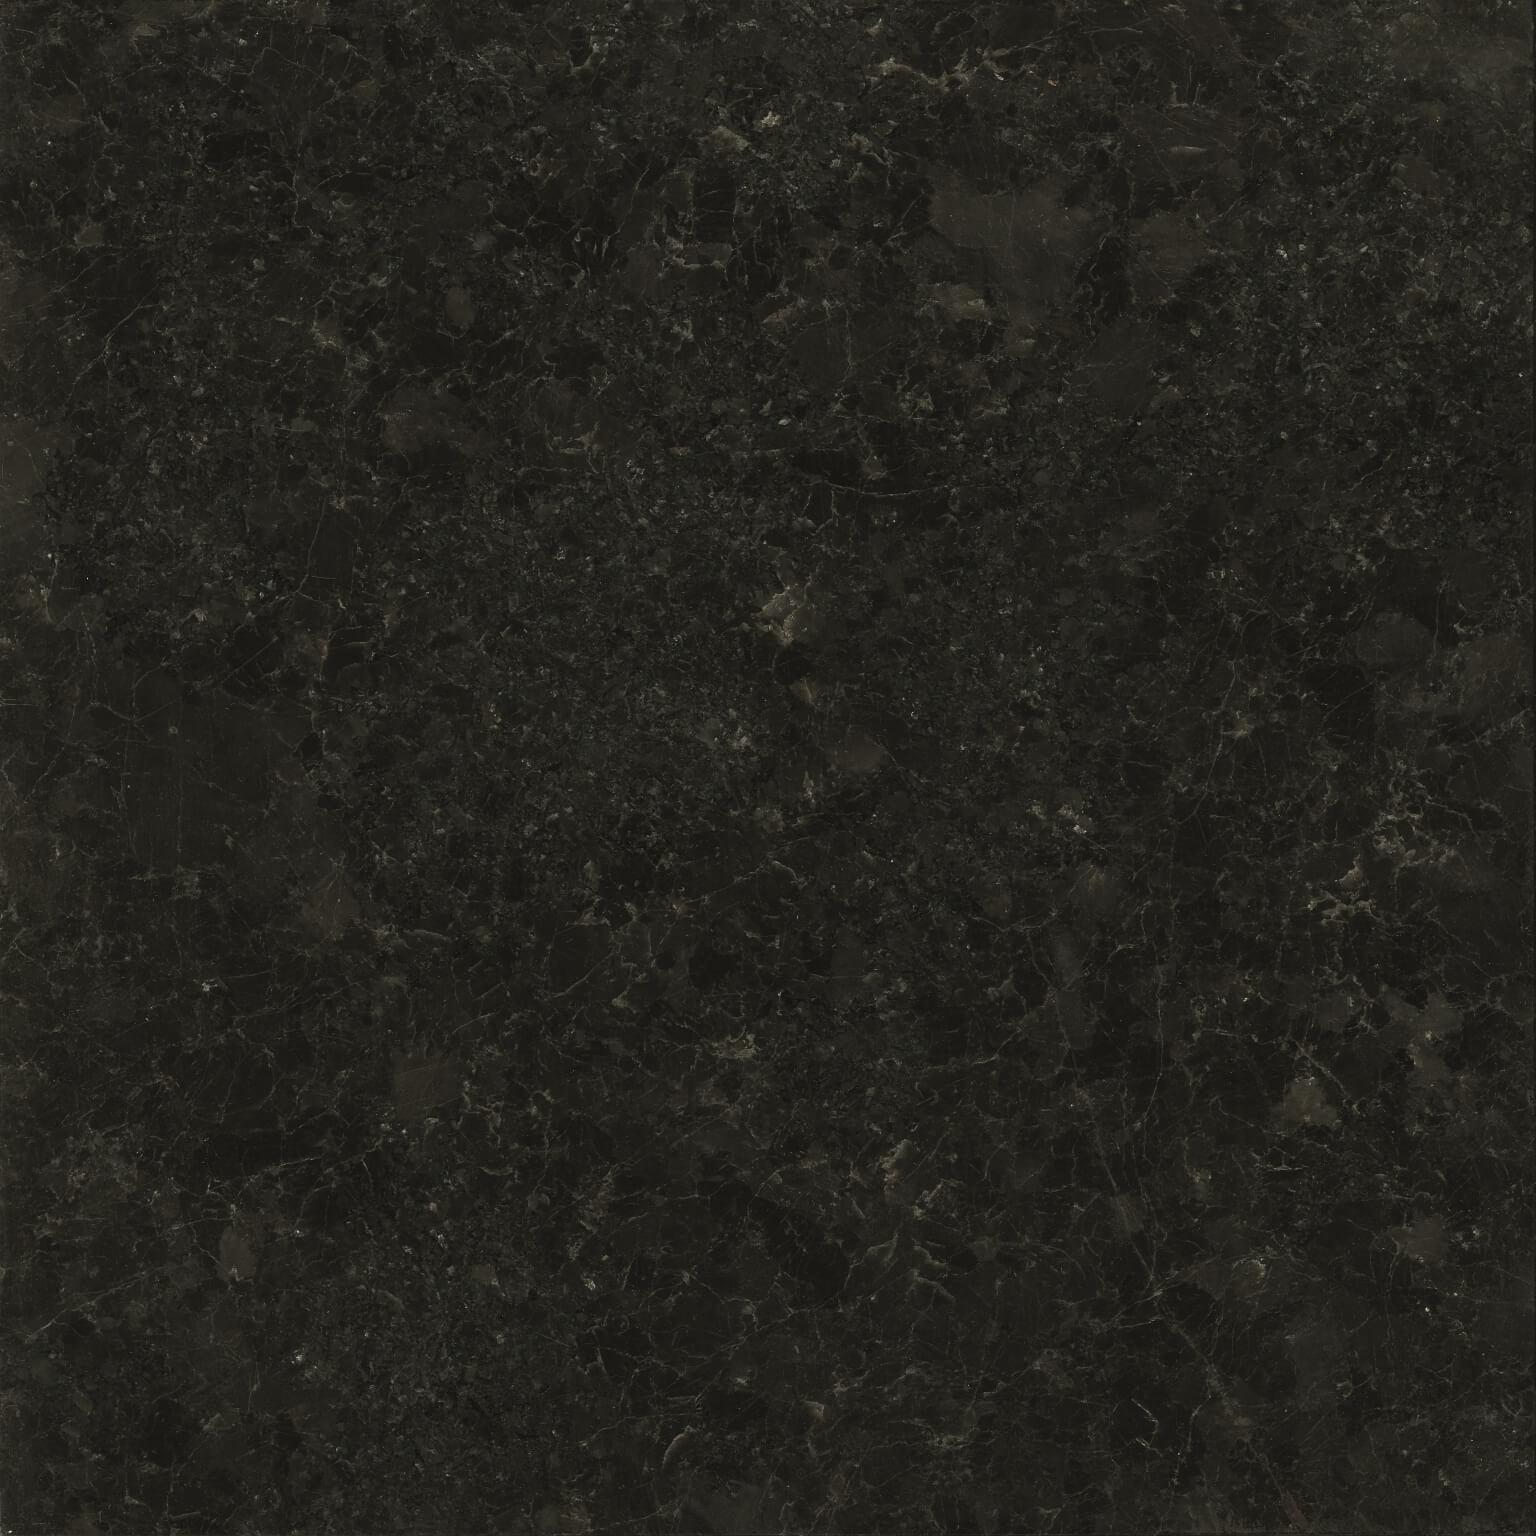 Saint Henry Black Granite Natural Stones Polycor